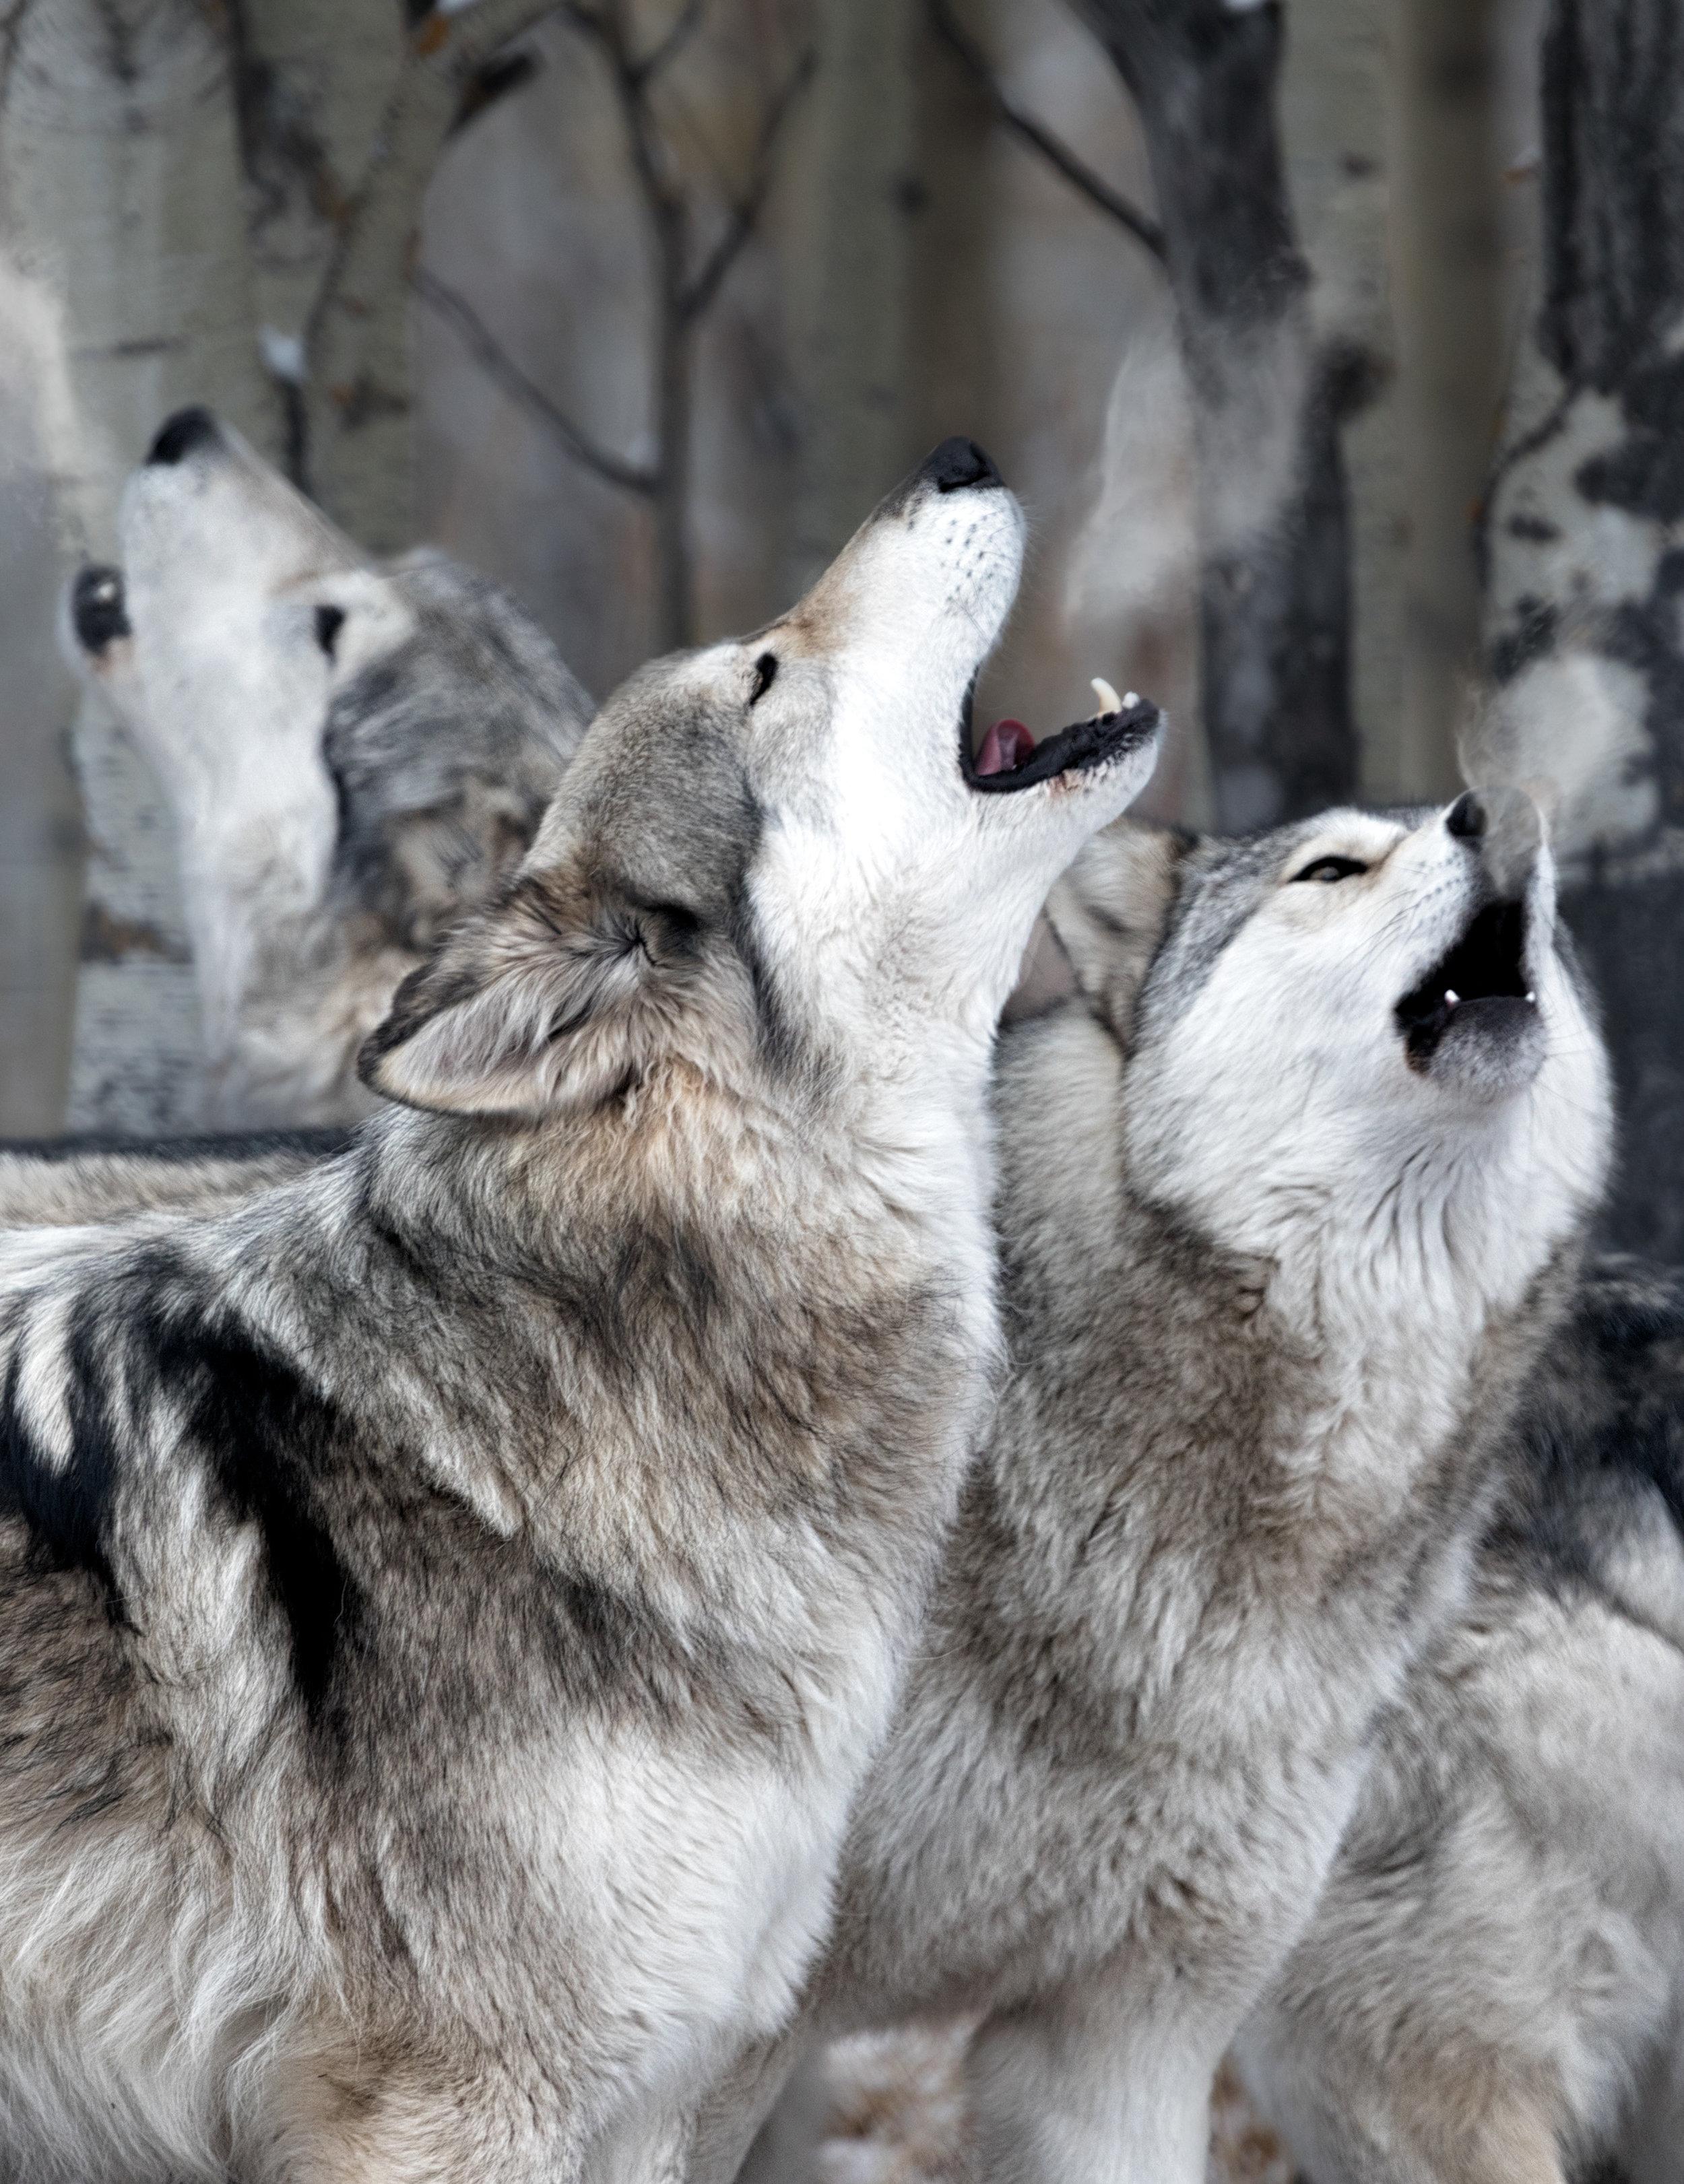 Wolf-Sanctuary-7523-vertinsta.jpg